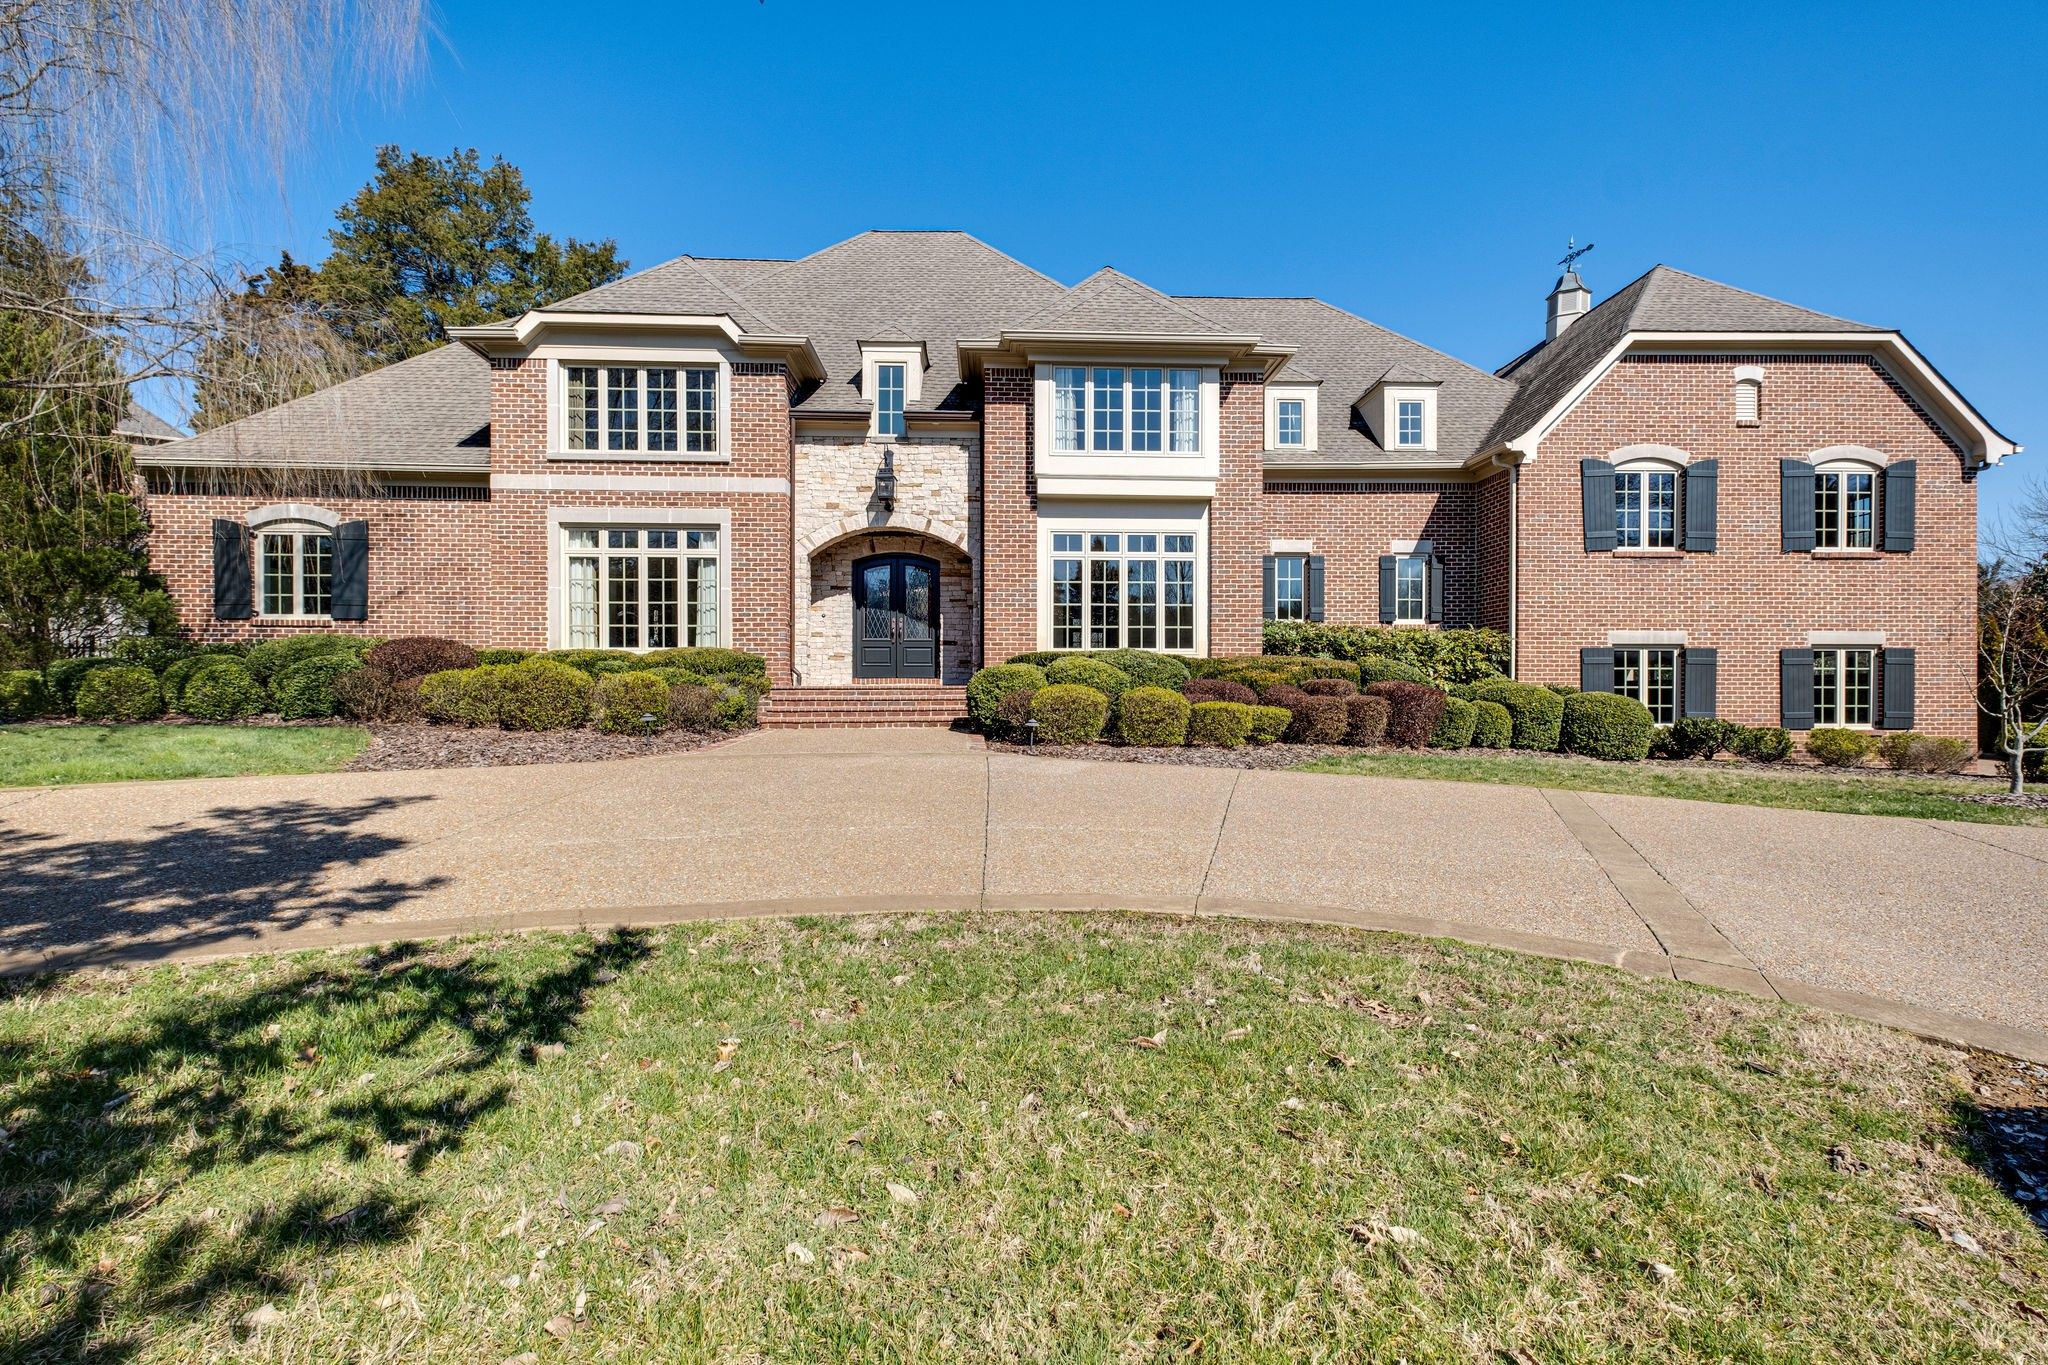 1925 Edenbridge Way, Nashville, TN 37215 - Nashville, TN real estate listing